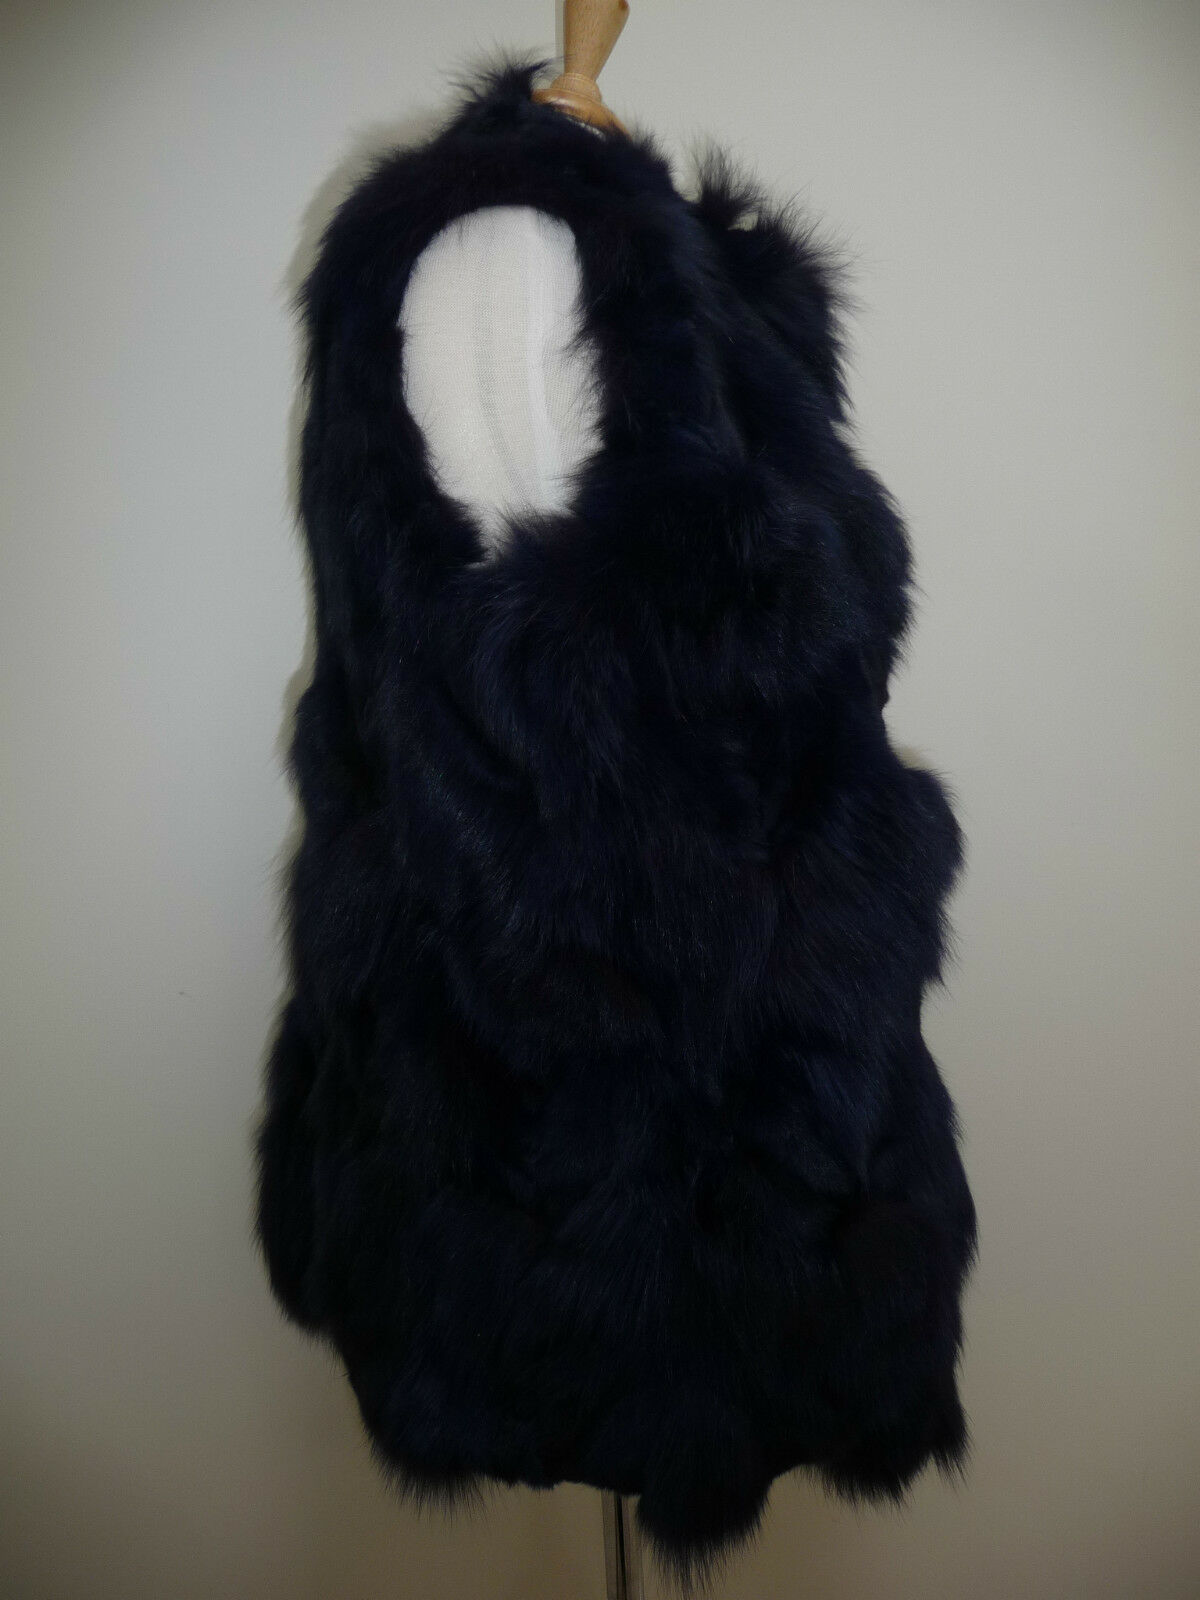 Jocelyn Bicolor Black Navy Roadie Fox Fur Vest New $1.1 image 7